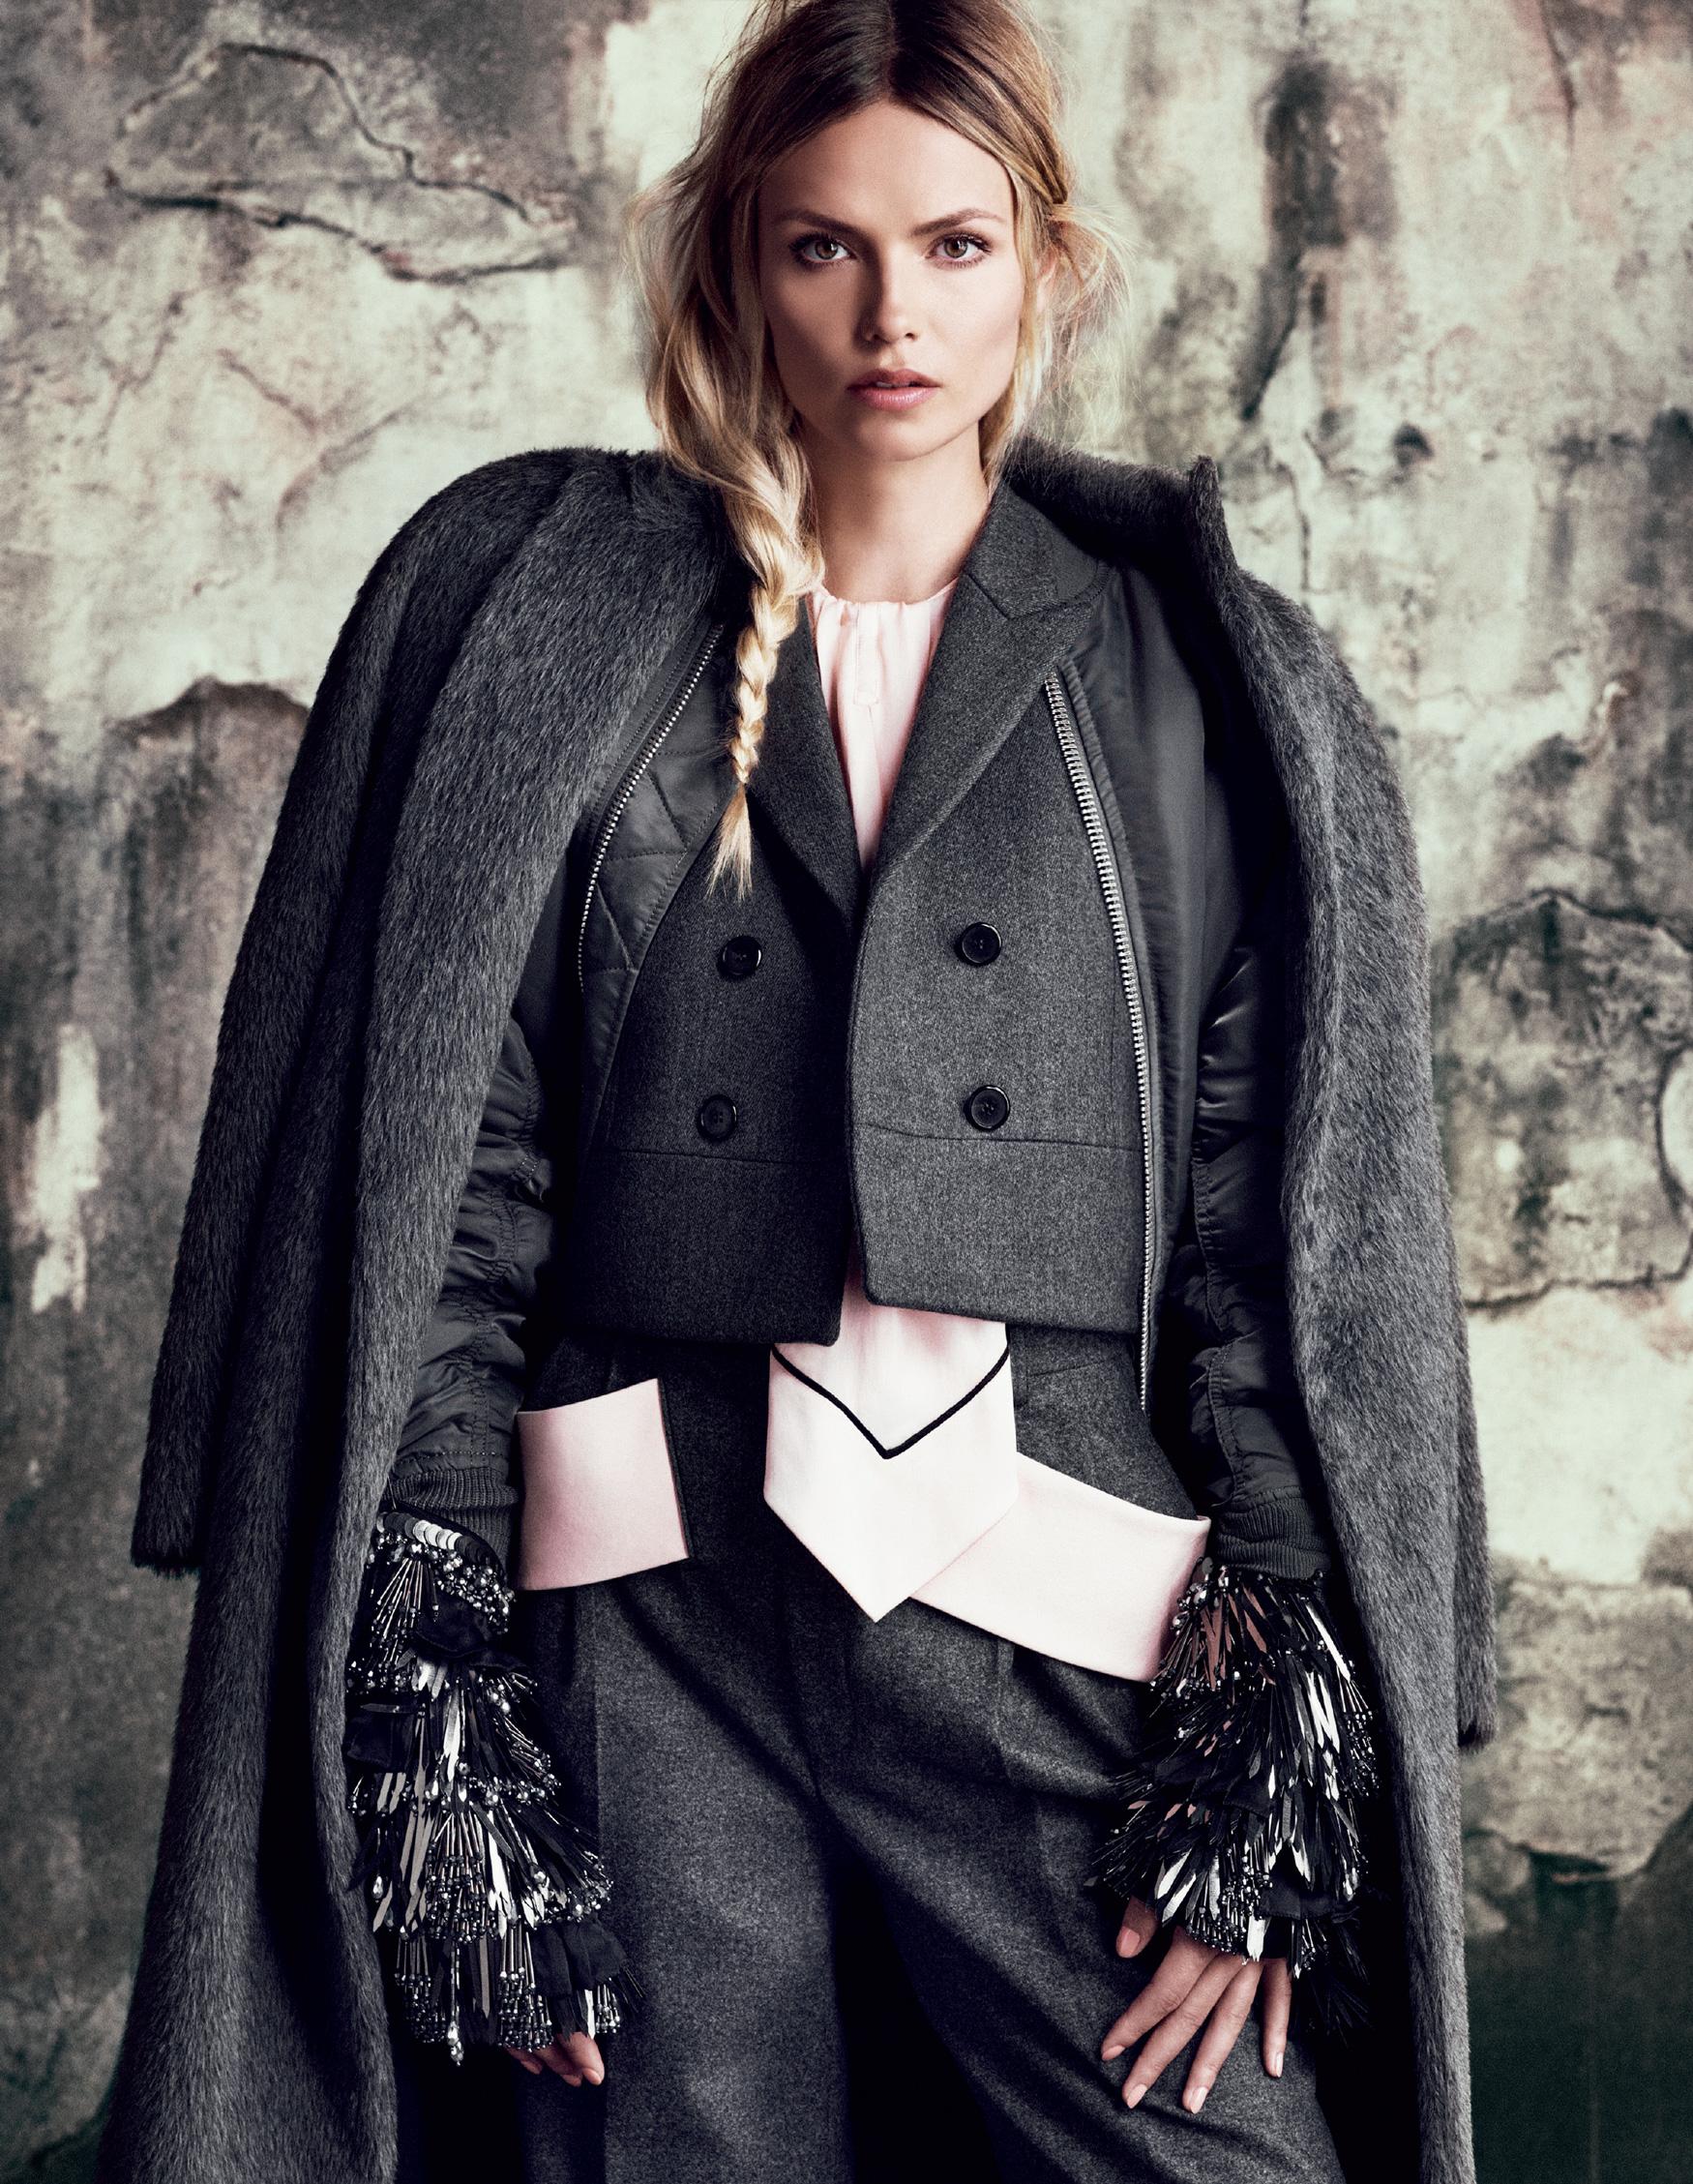 Giovanna-Battaglia-The-Icons-Of-Perfections-Vogue-Japan-15th-Anniversary-Issue-Luigi-Iango-V181_252_200-16.jpg